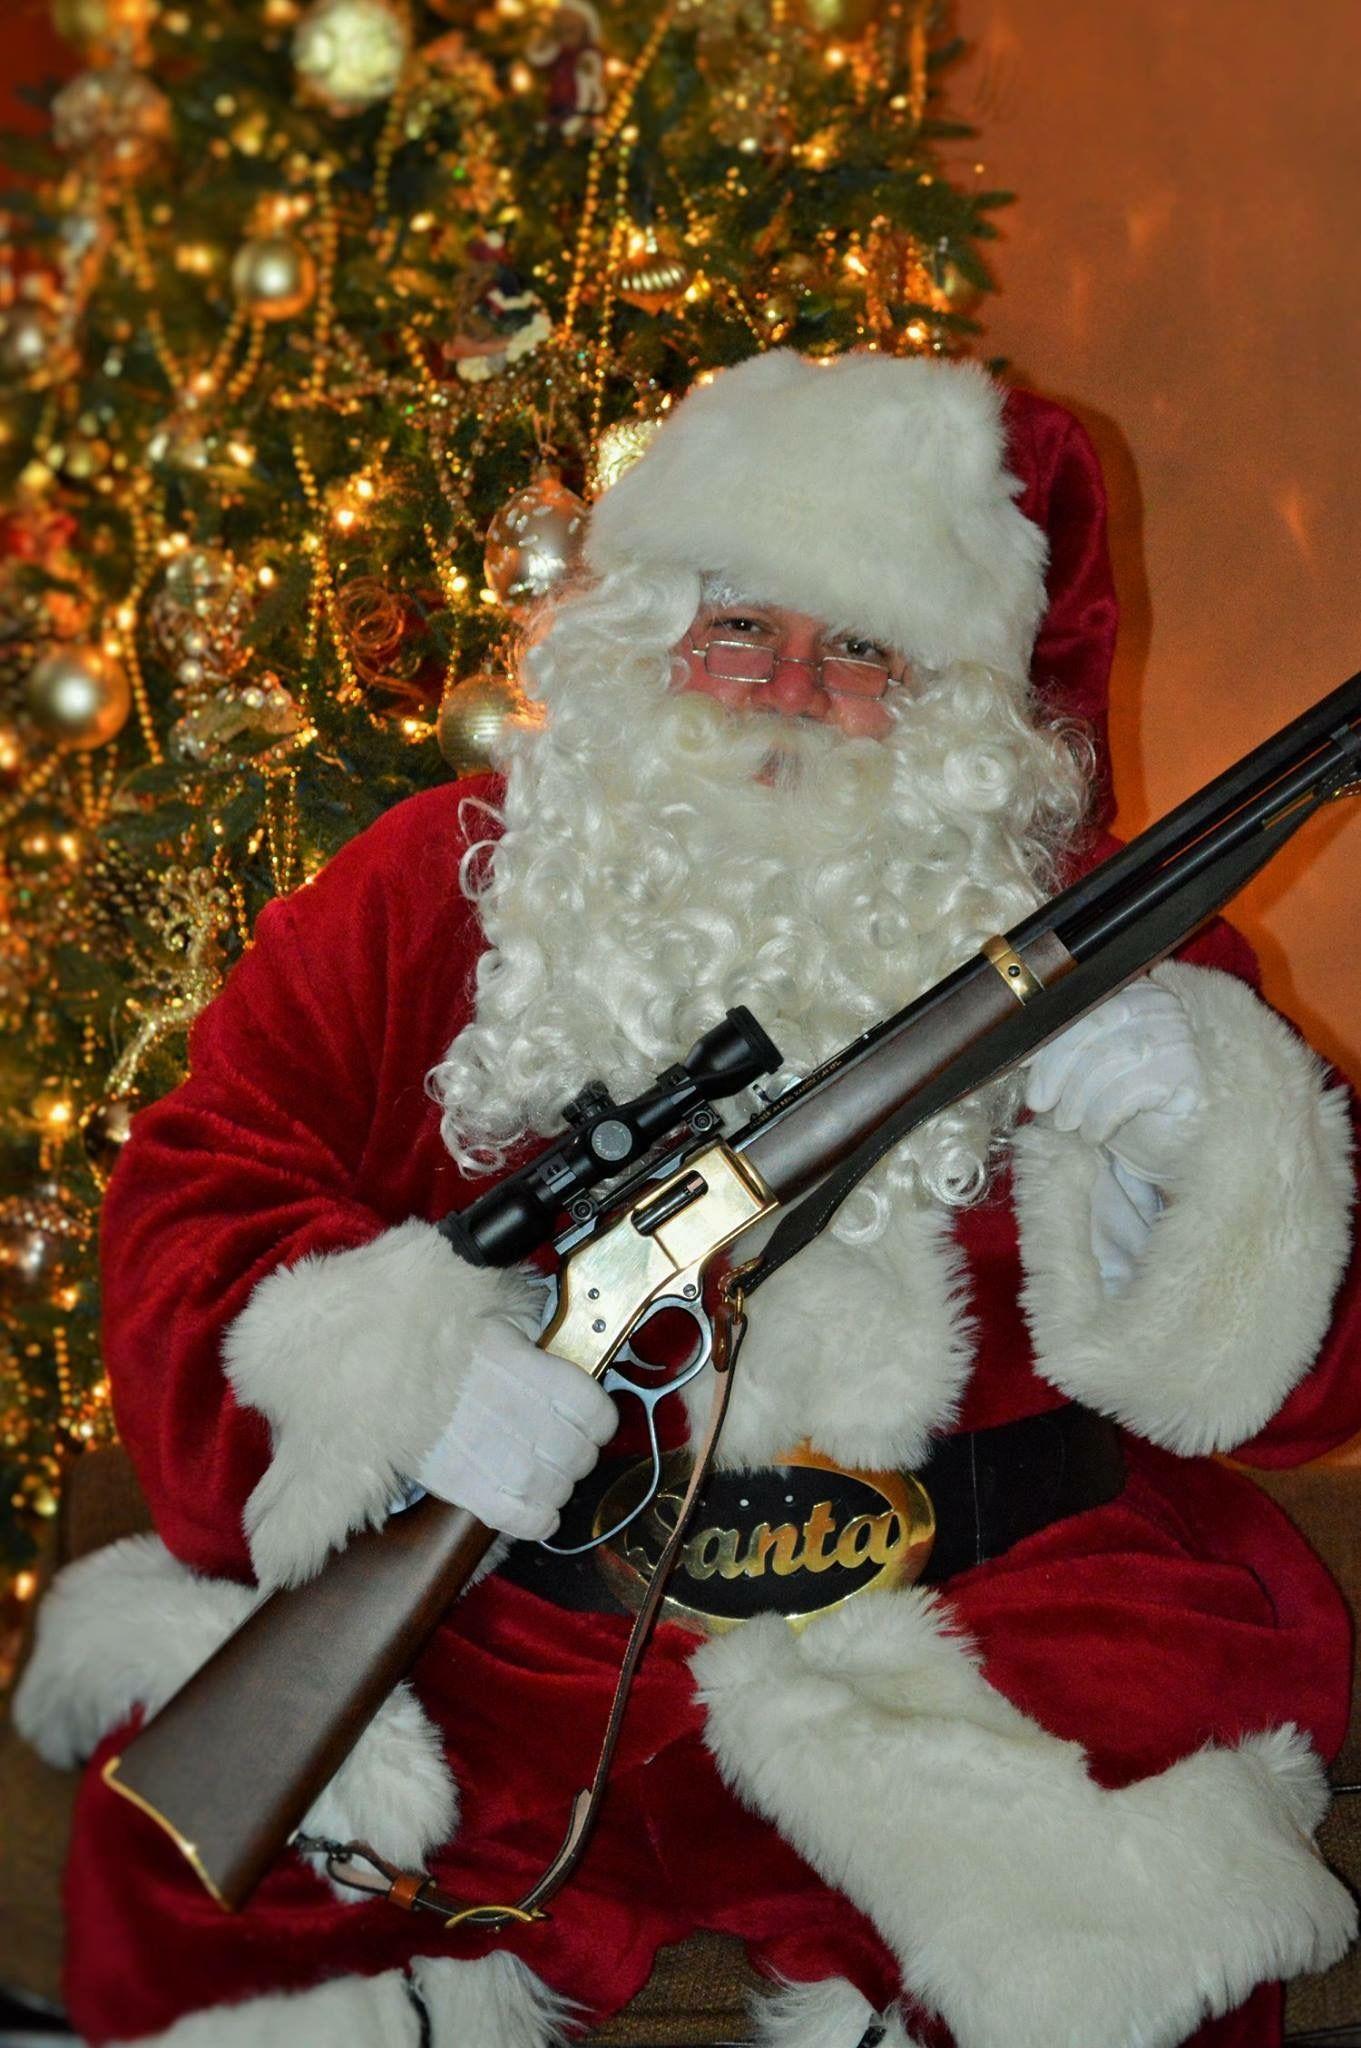 Merry Christmas gun lovers! Hope you got a firearm for Christmas ...